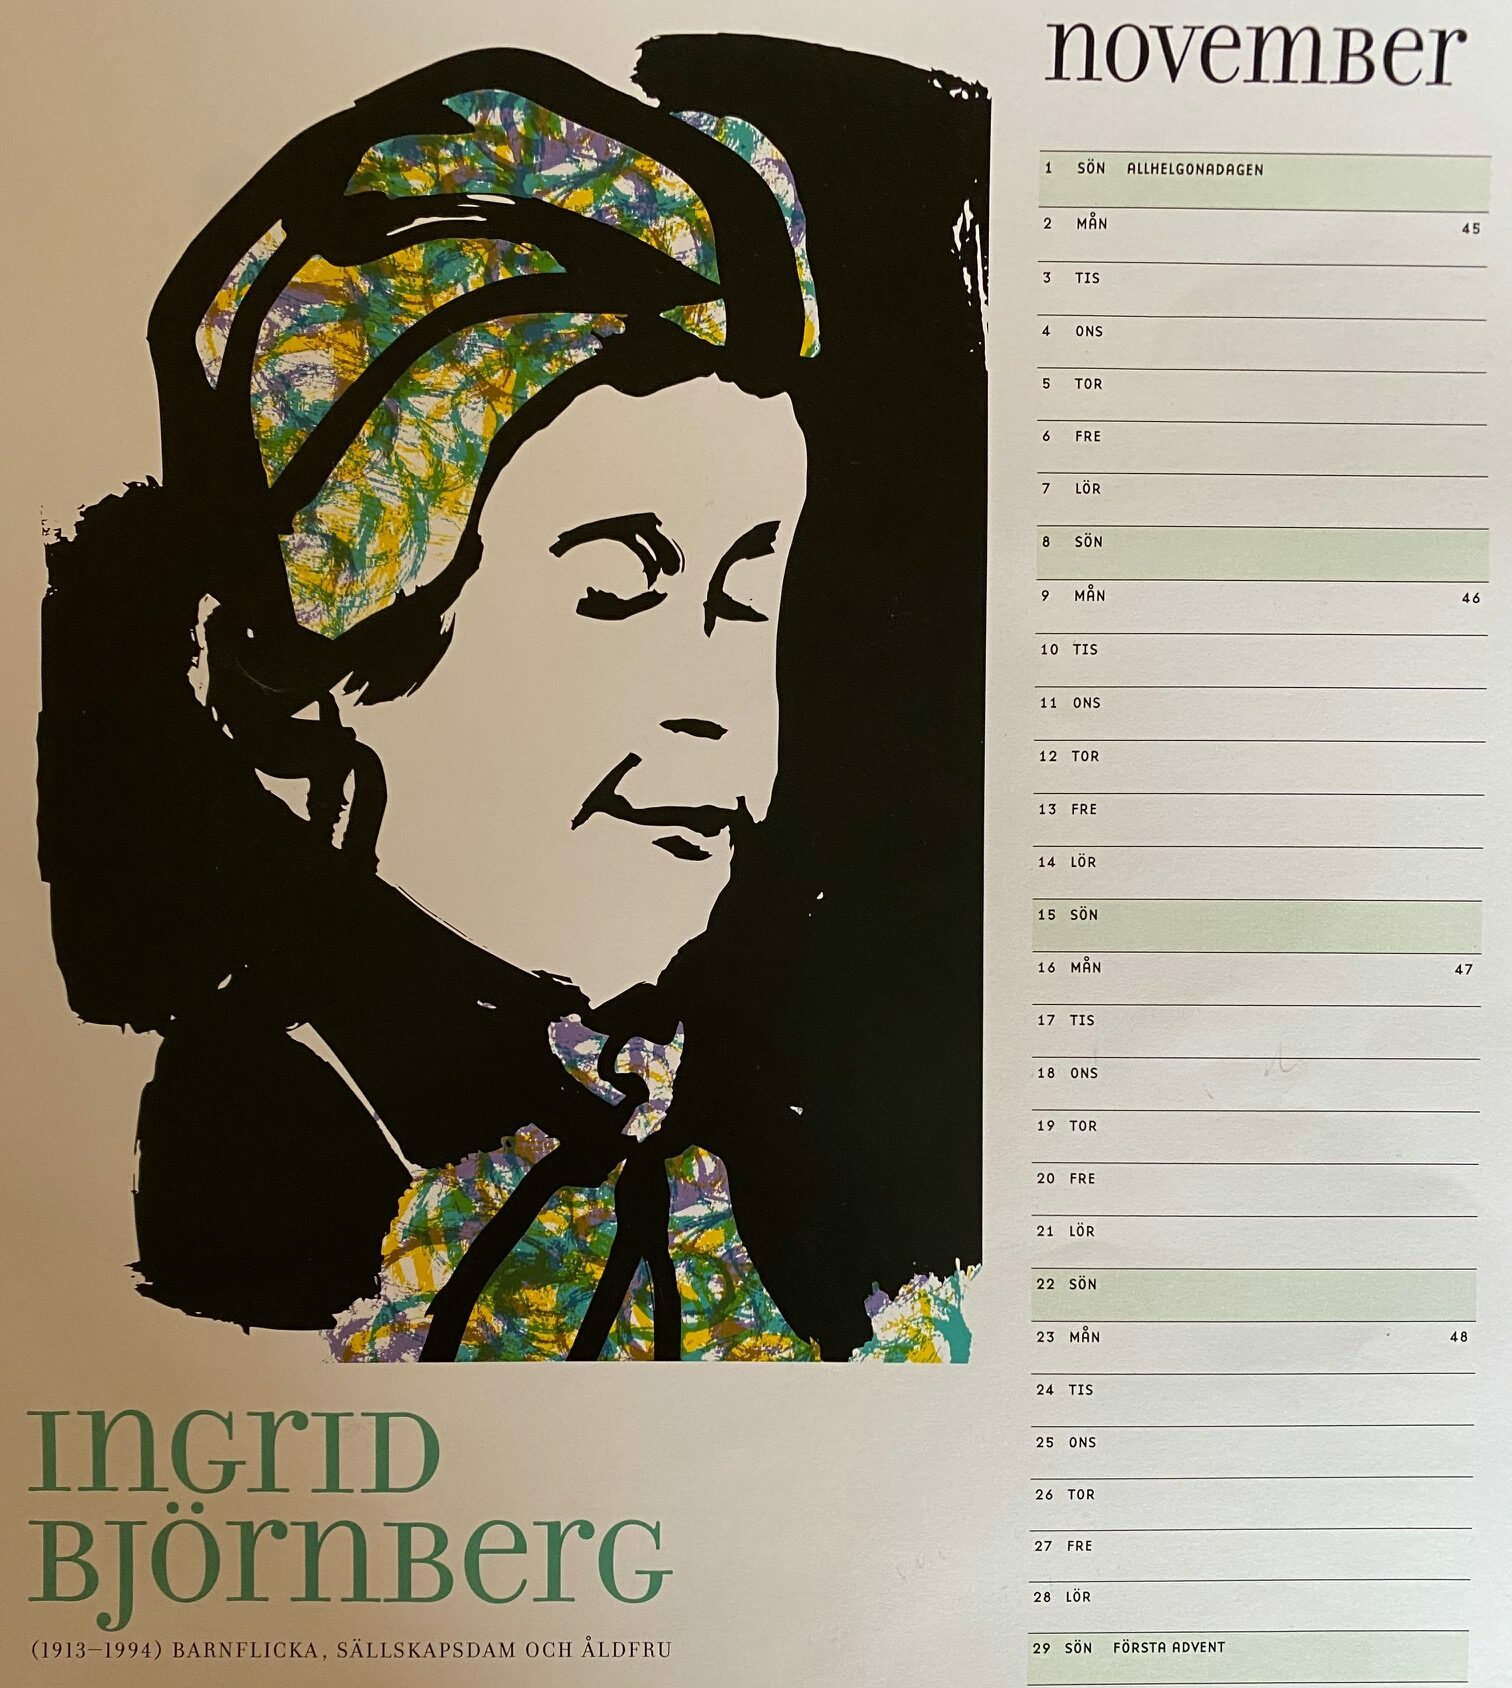 Ingrid Björnberg